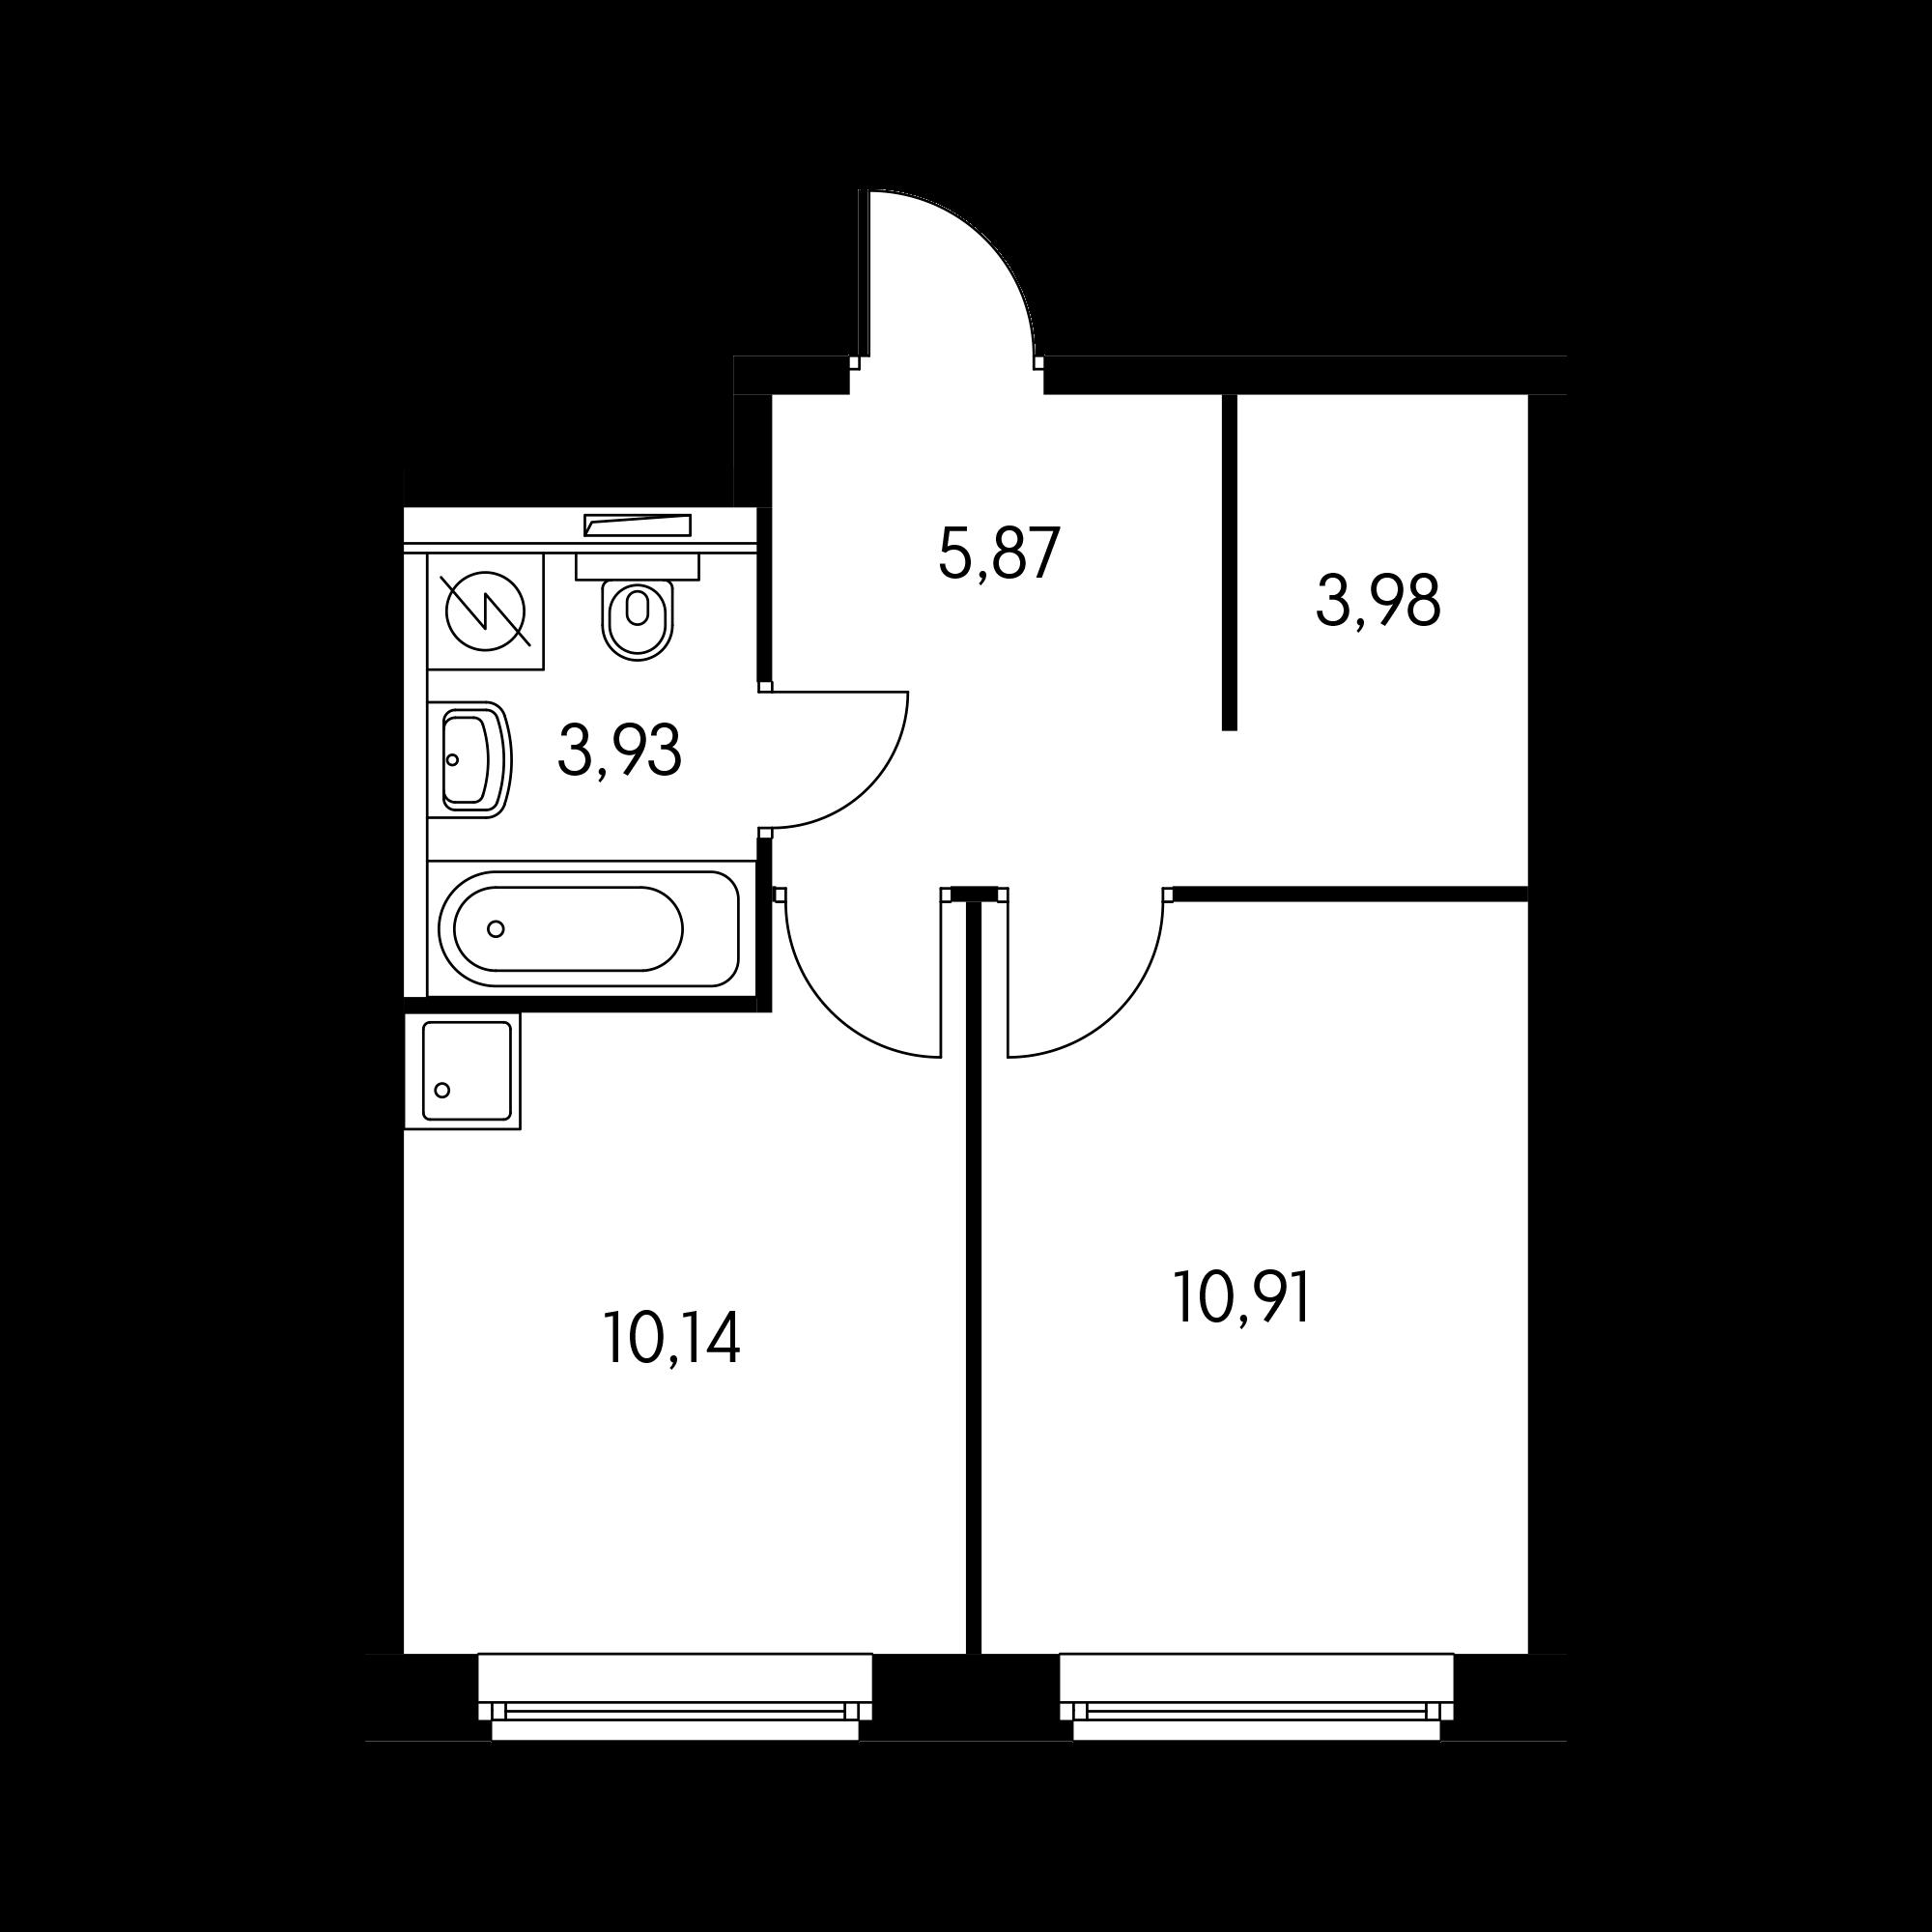 1KS2_6.0-1_2